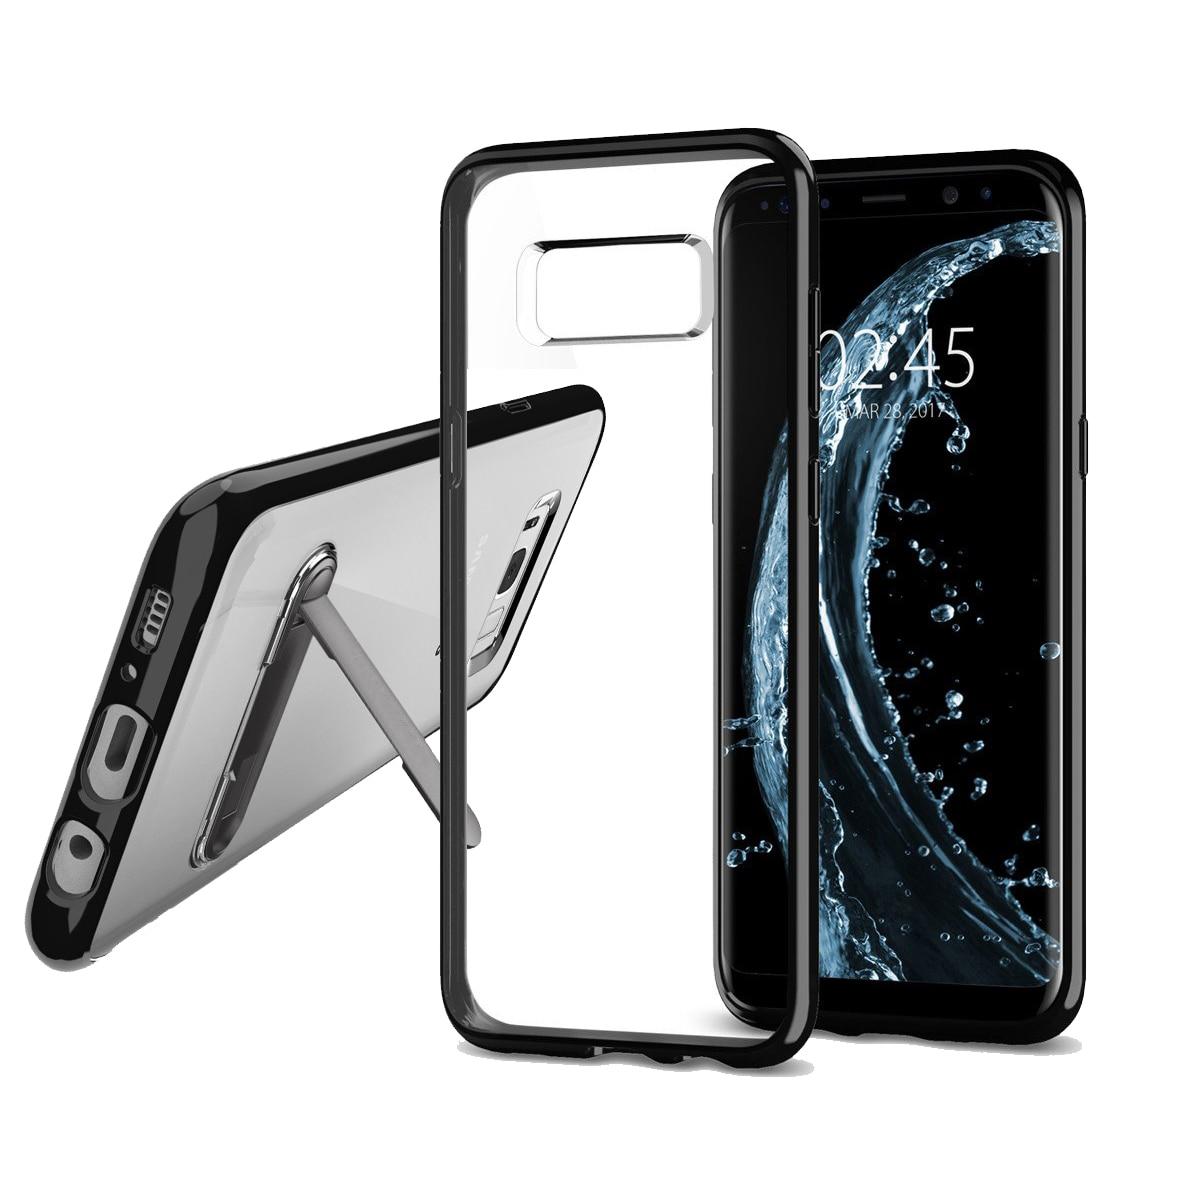 Цена за Original Spigen Ultra Hybrid Galaxy S8 / Galaxy S8 Plus Case - ТПУ Край + прочный ПК Ясно Назад Mil Класса Гибридные Чехлы для Samsung Galaxy S8 / S8 Plus